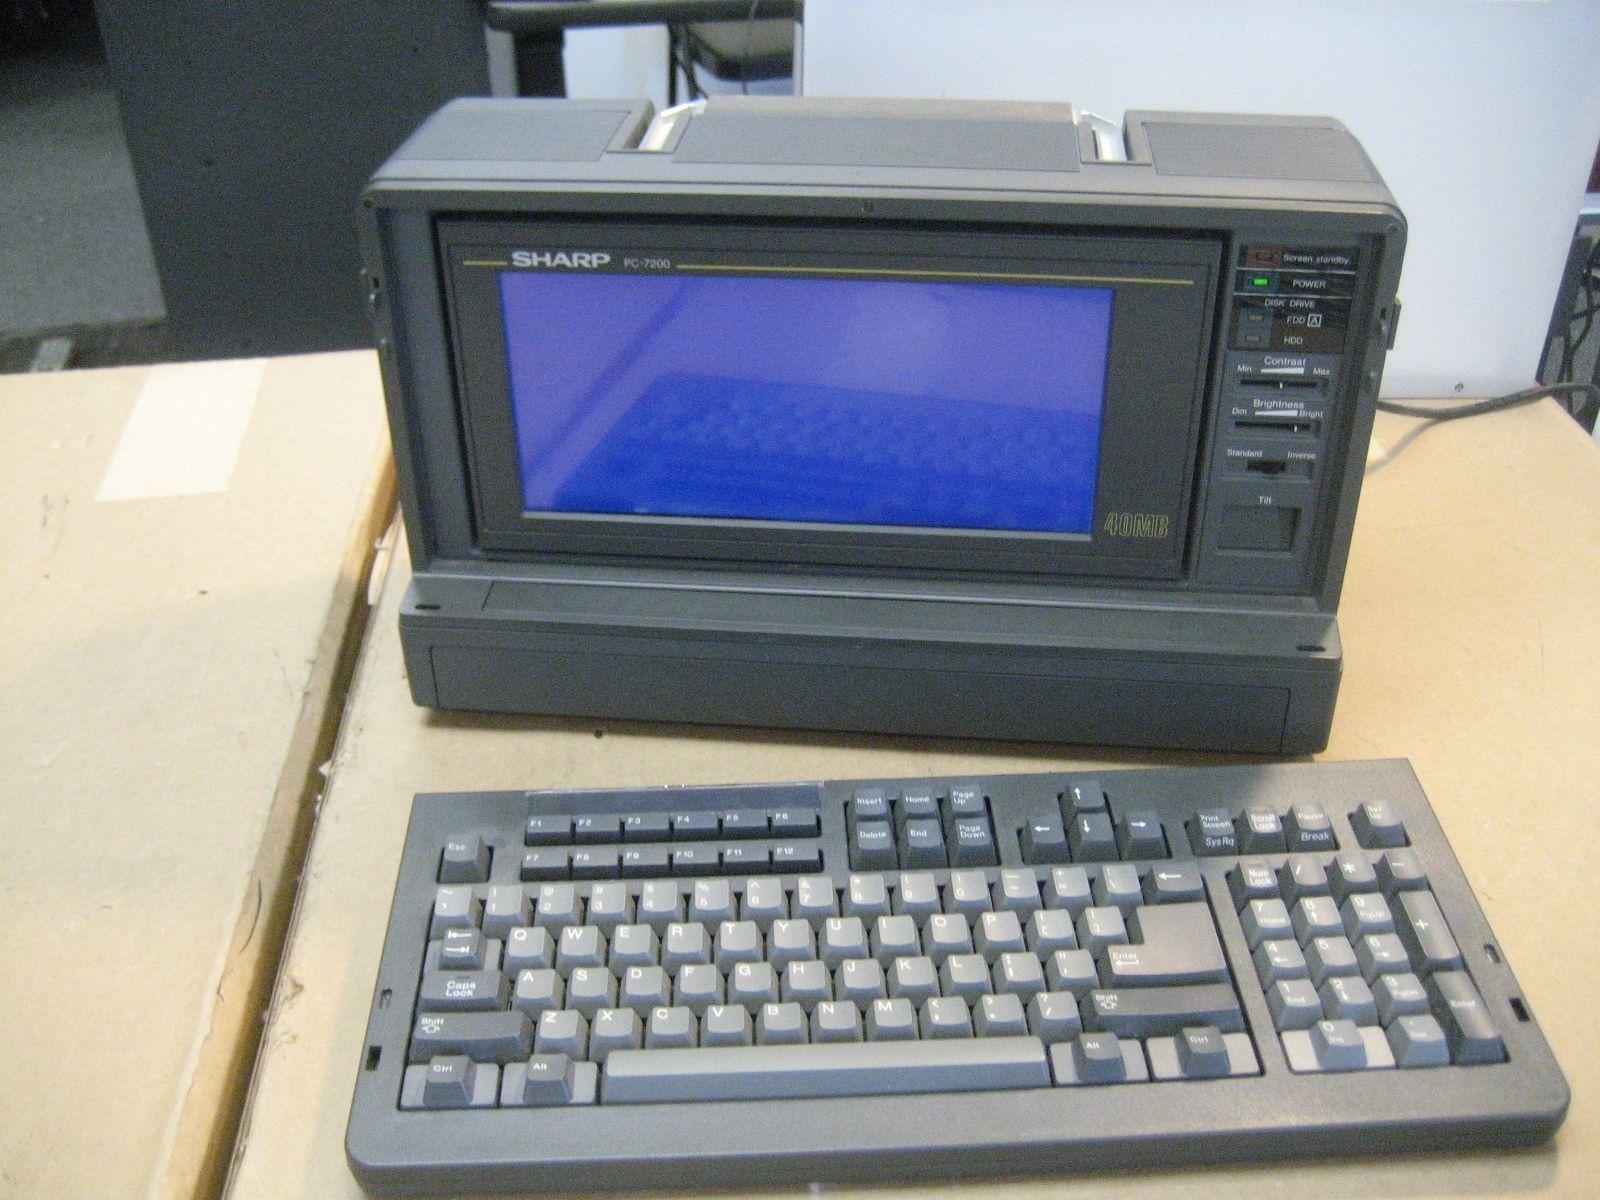 Sharp Personal Computer PC-7241.